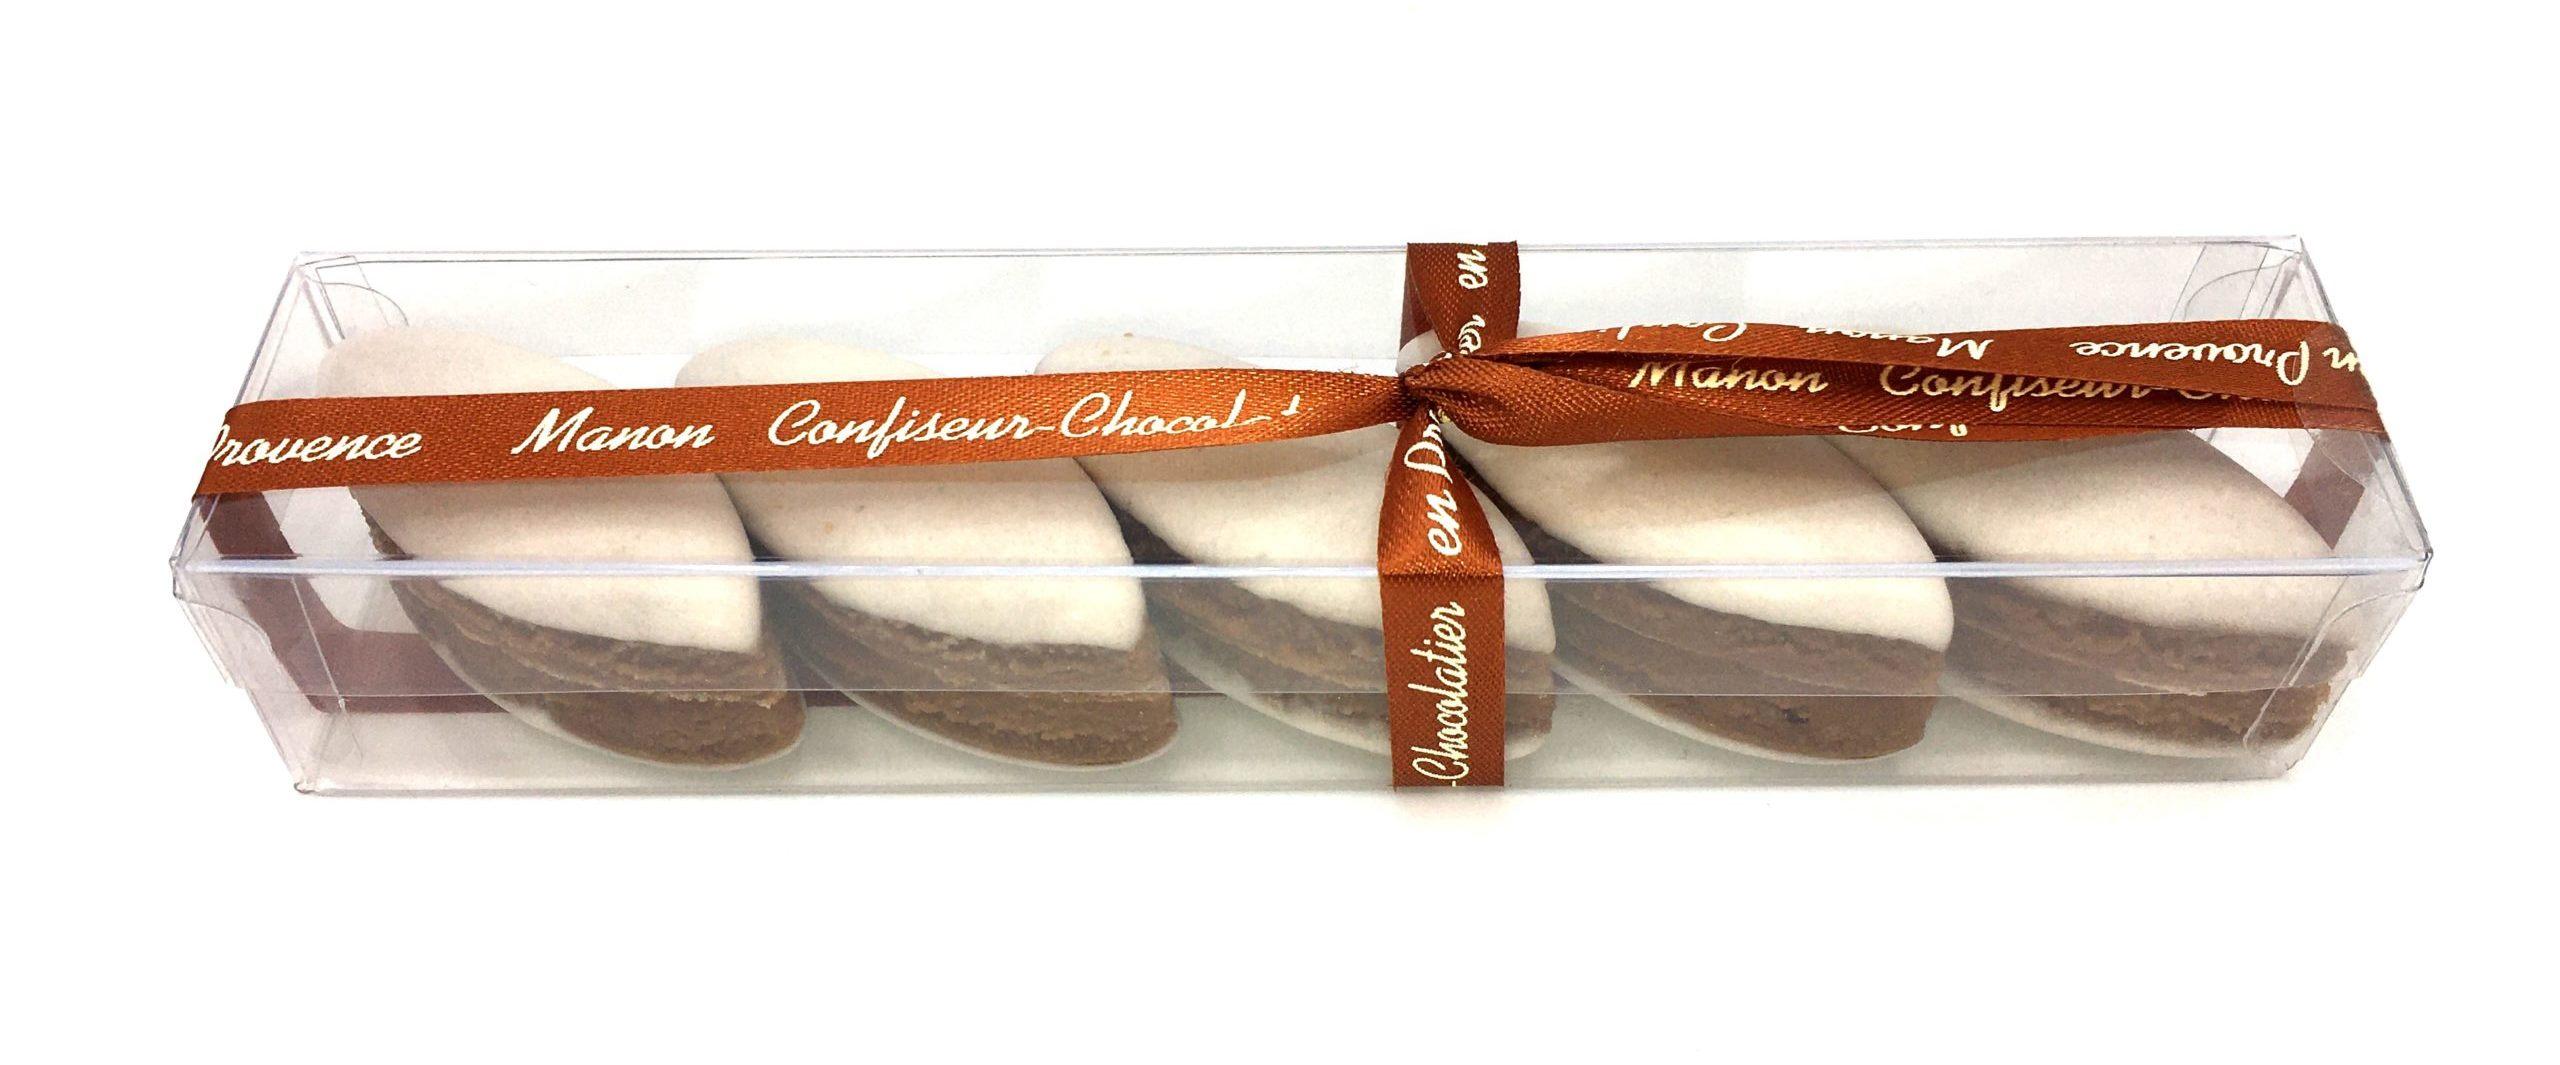 Calissons chocolat noisette